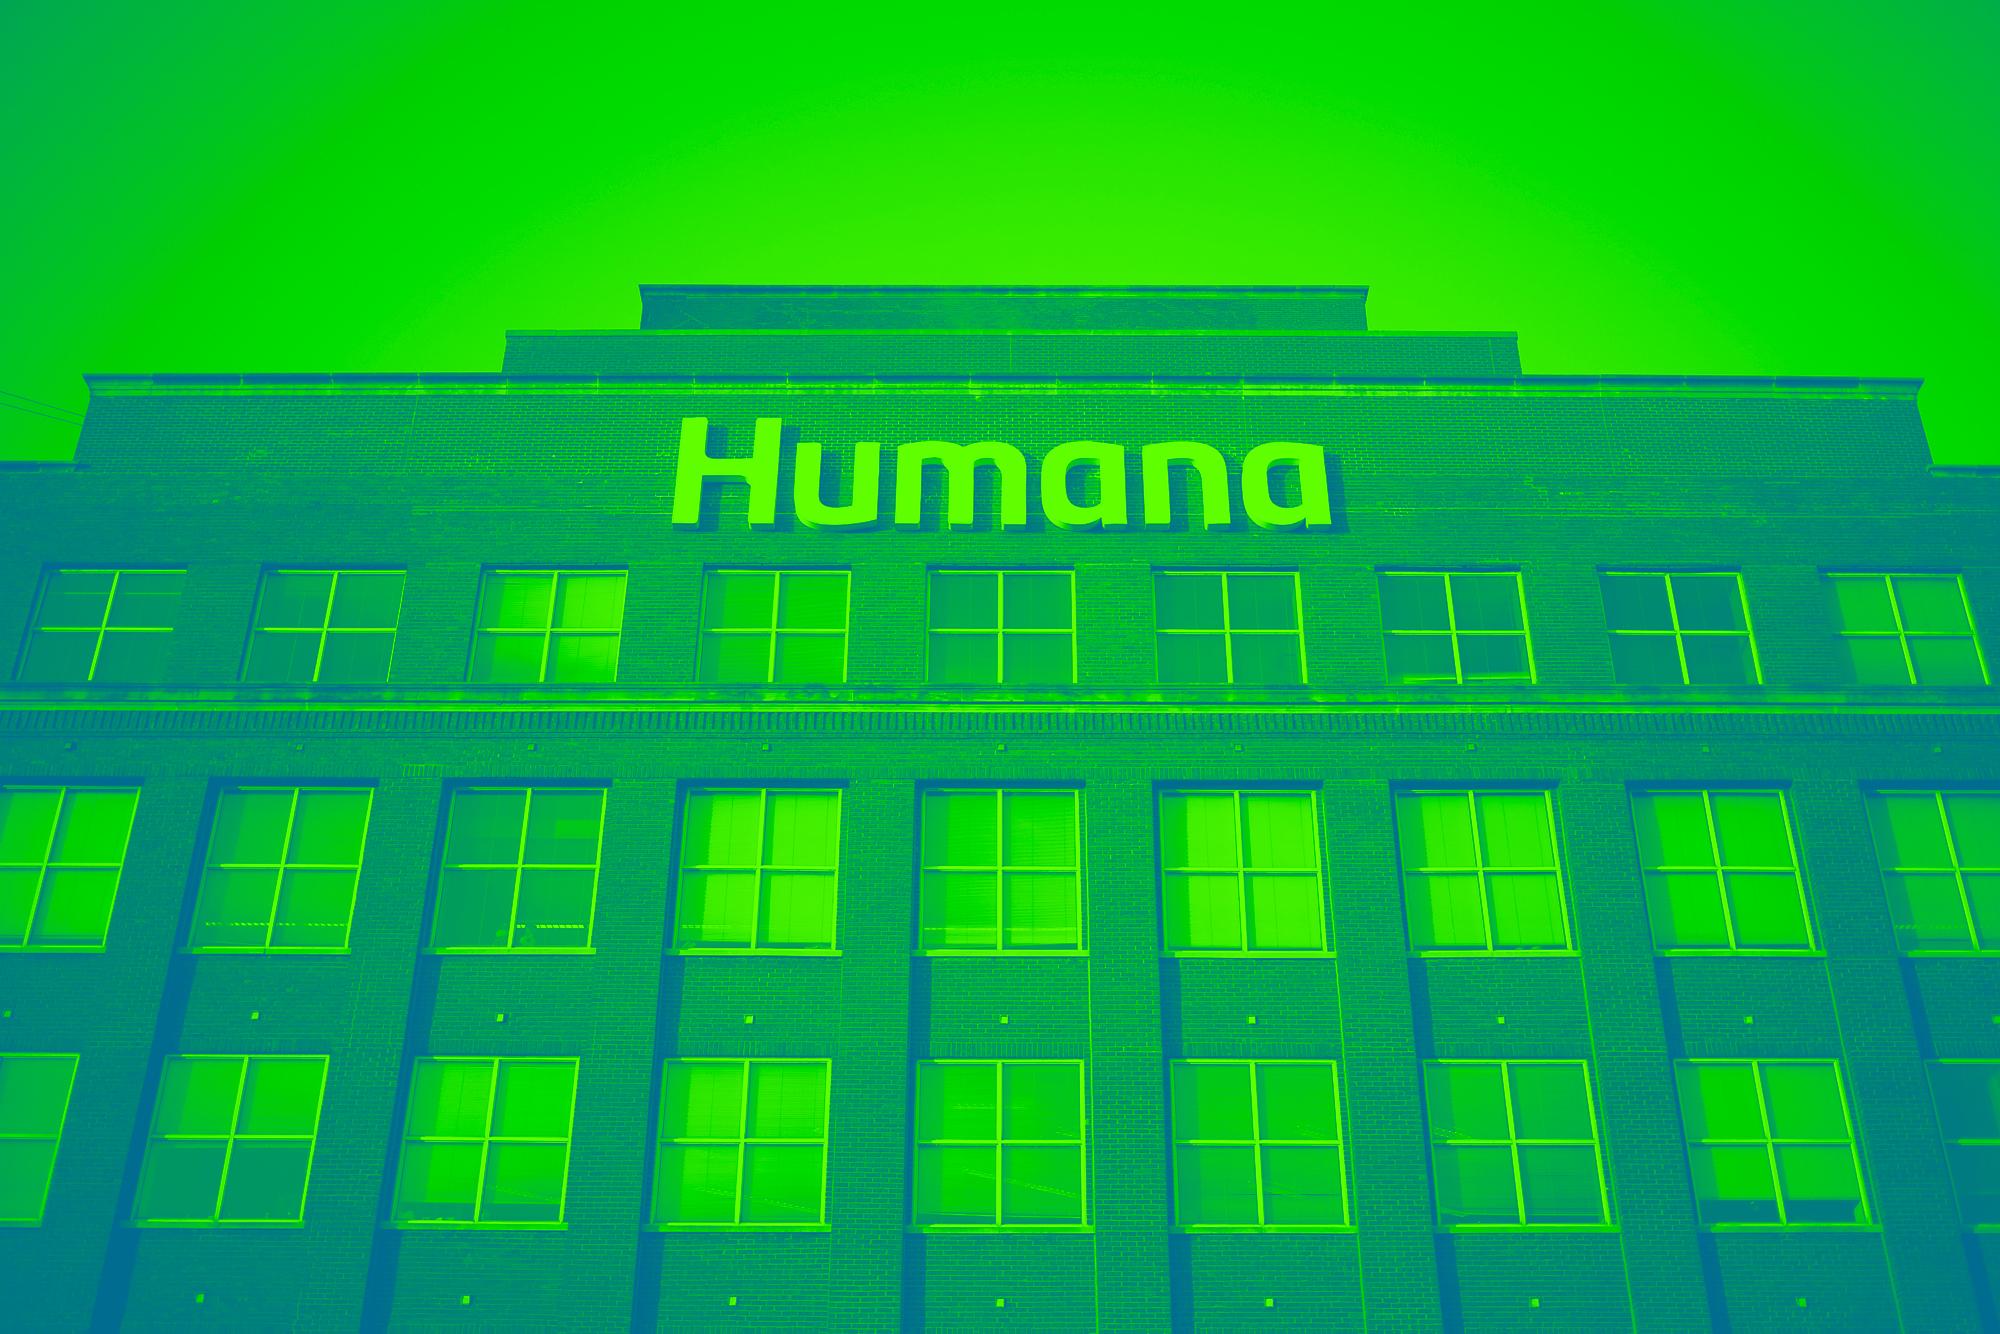 MullenLowe wins Humana's creative account